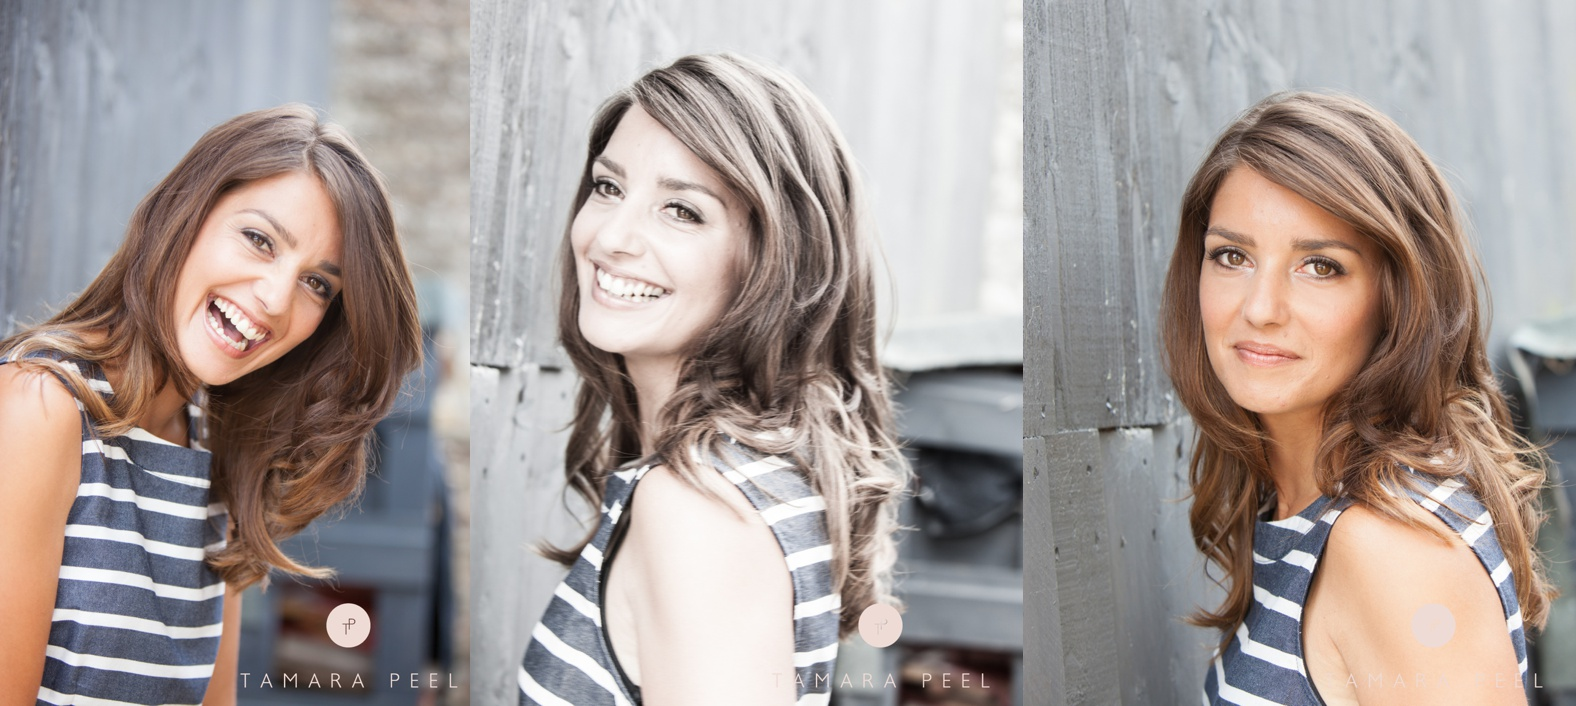 Tamara Peel. V,Macken,photographer,female_0068